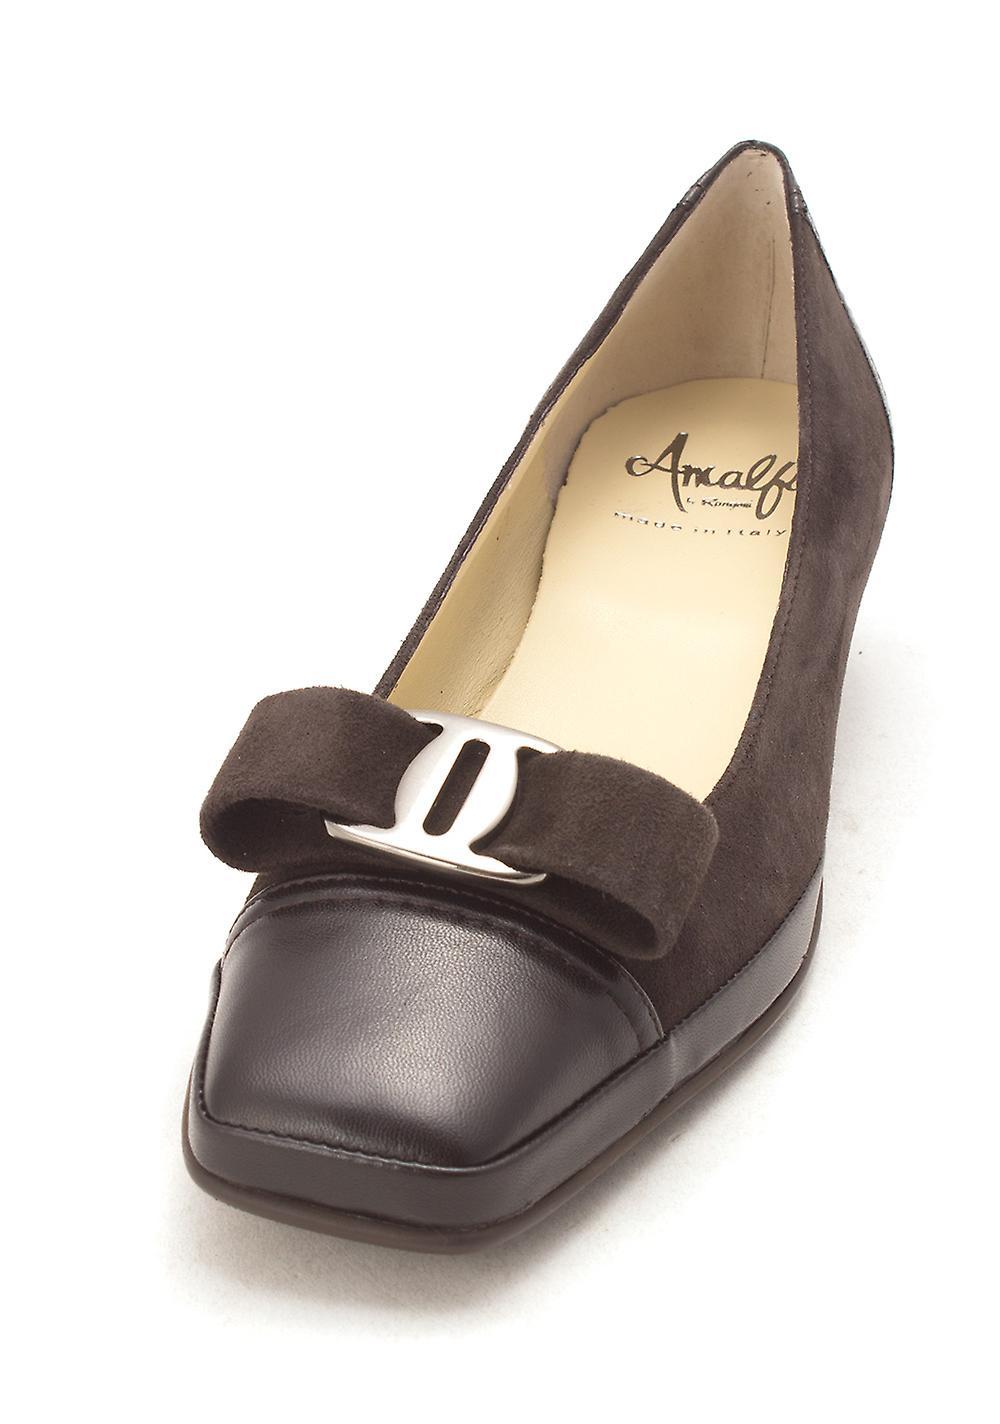 Amalfi by Rangoni Womens Mambo Leather Square Toe Classic Pumps